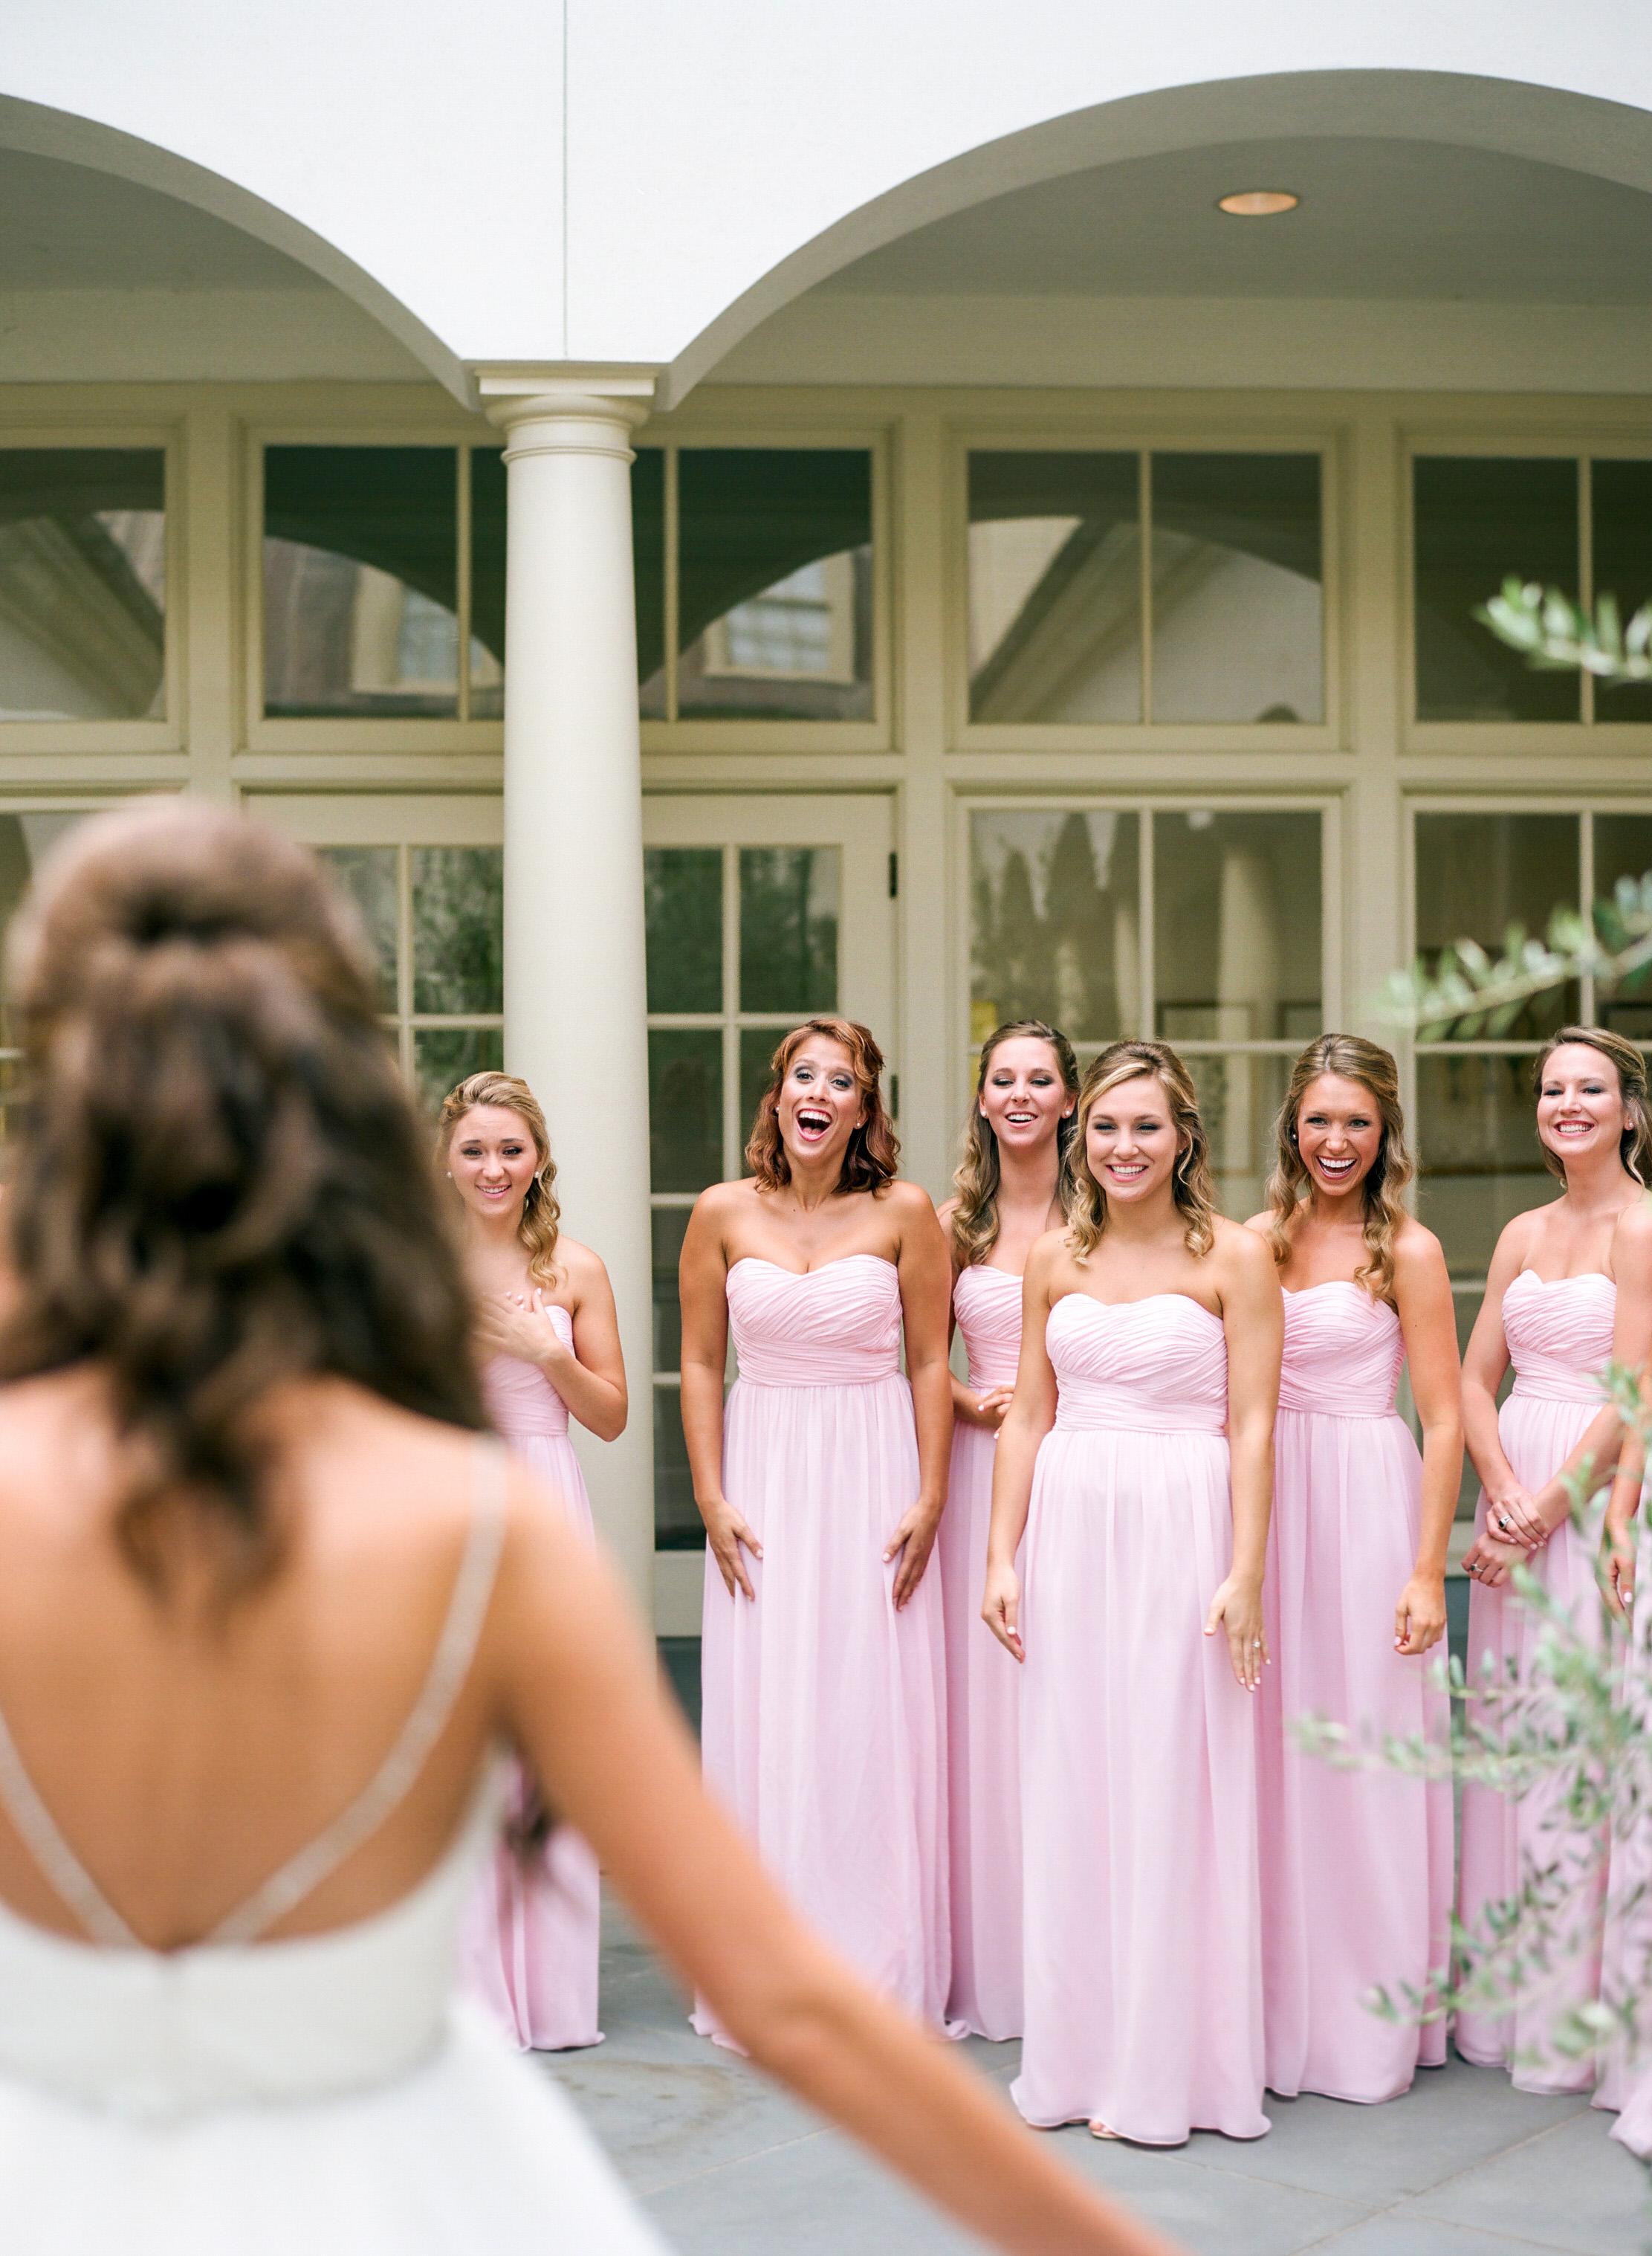 Dana-Fernandez-Photography-Weddings-in-Houston-Magazine-feature-Houston-wedding-photographer-film-9.jpg